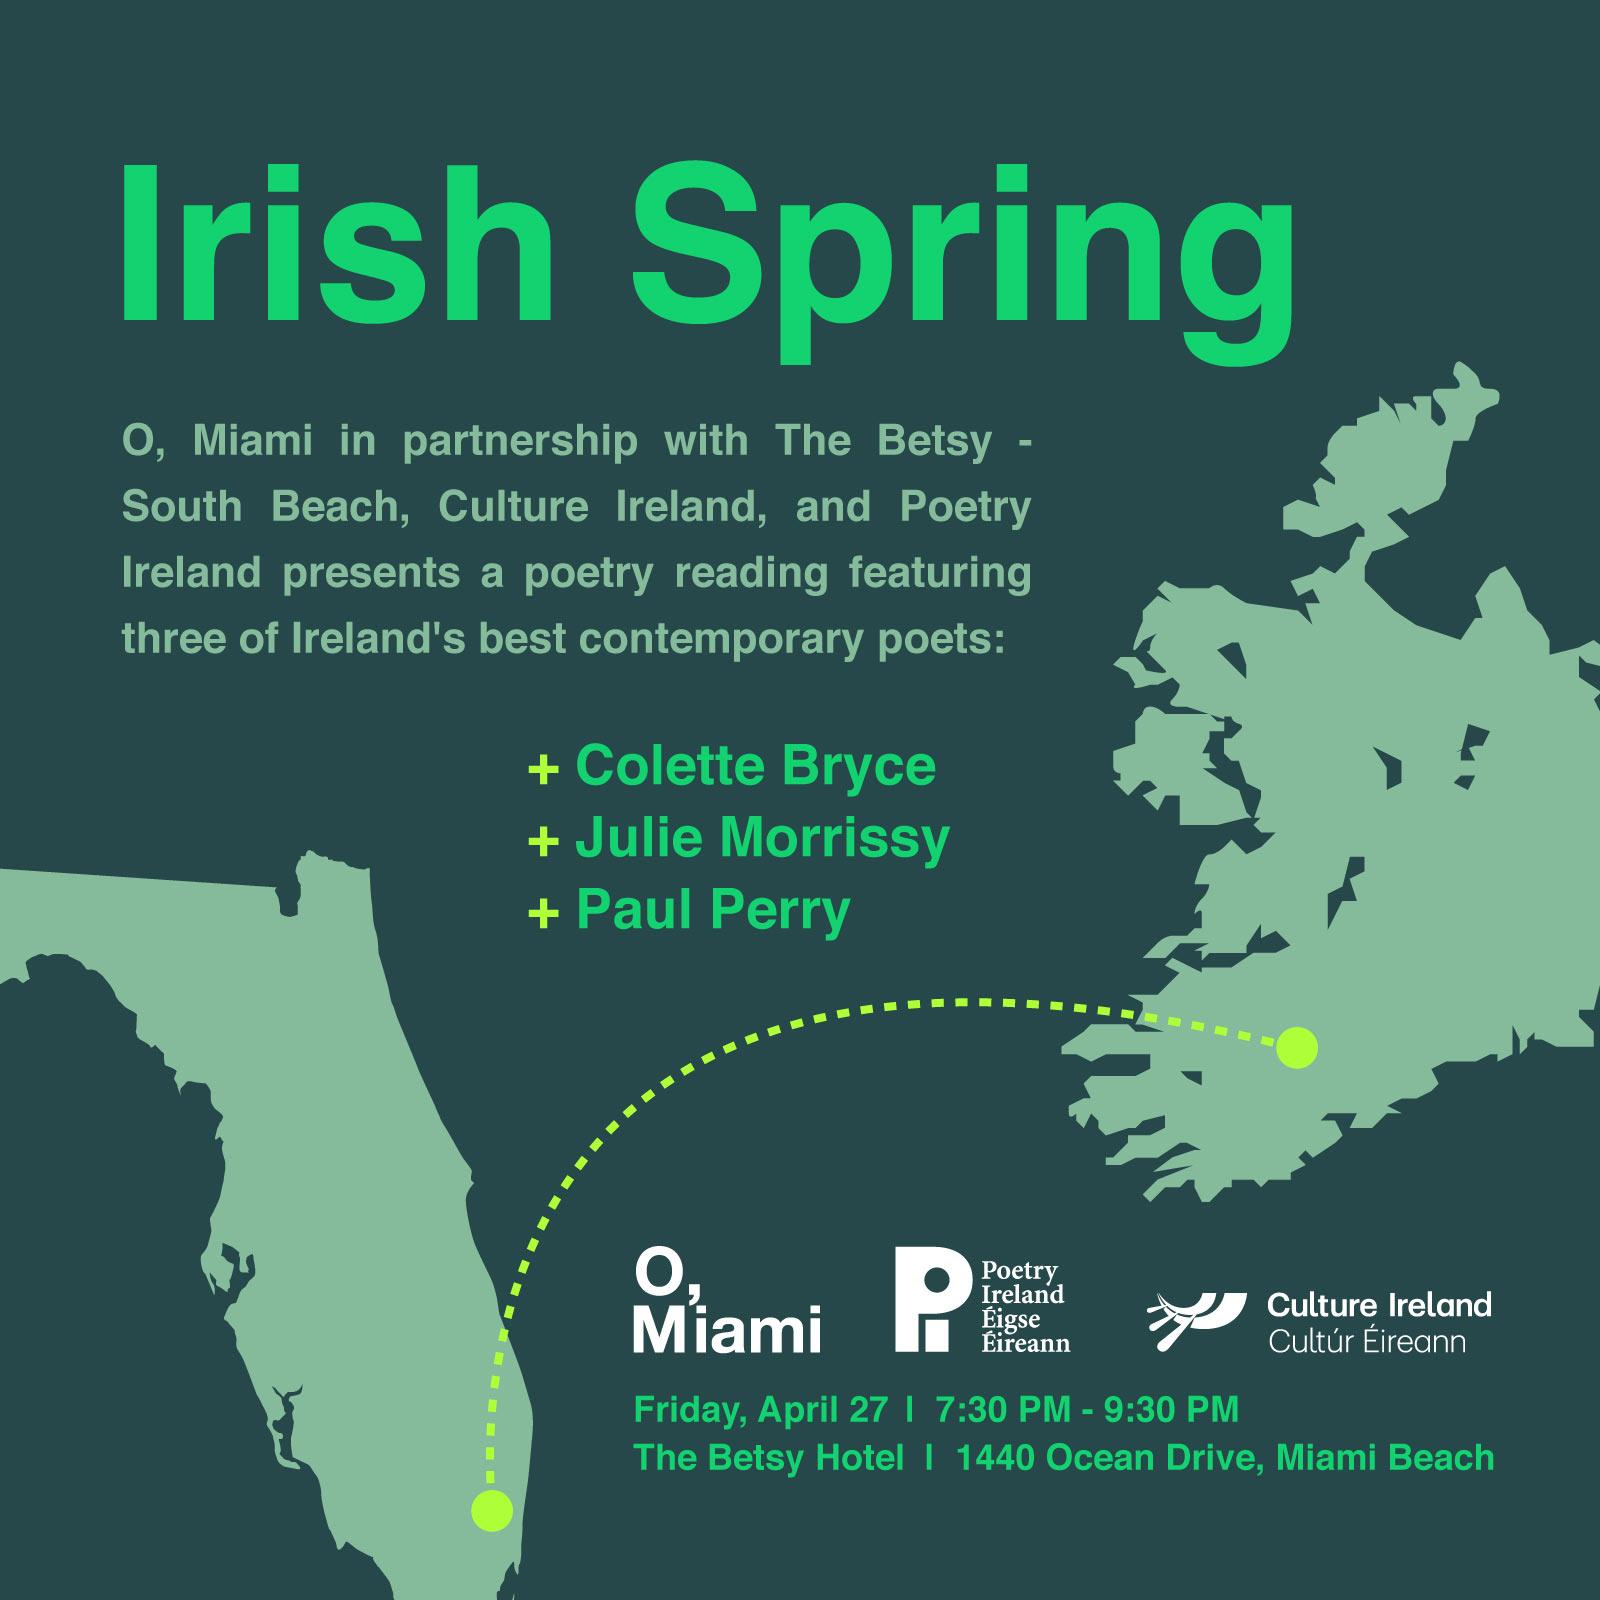 OM-IrishSpring-IG-040918.jpg